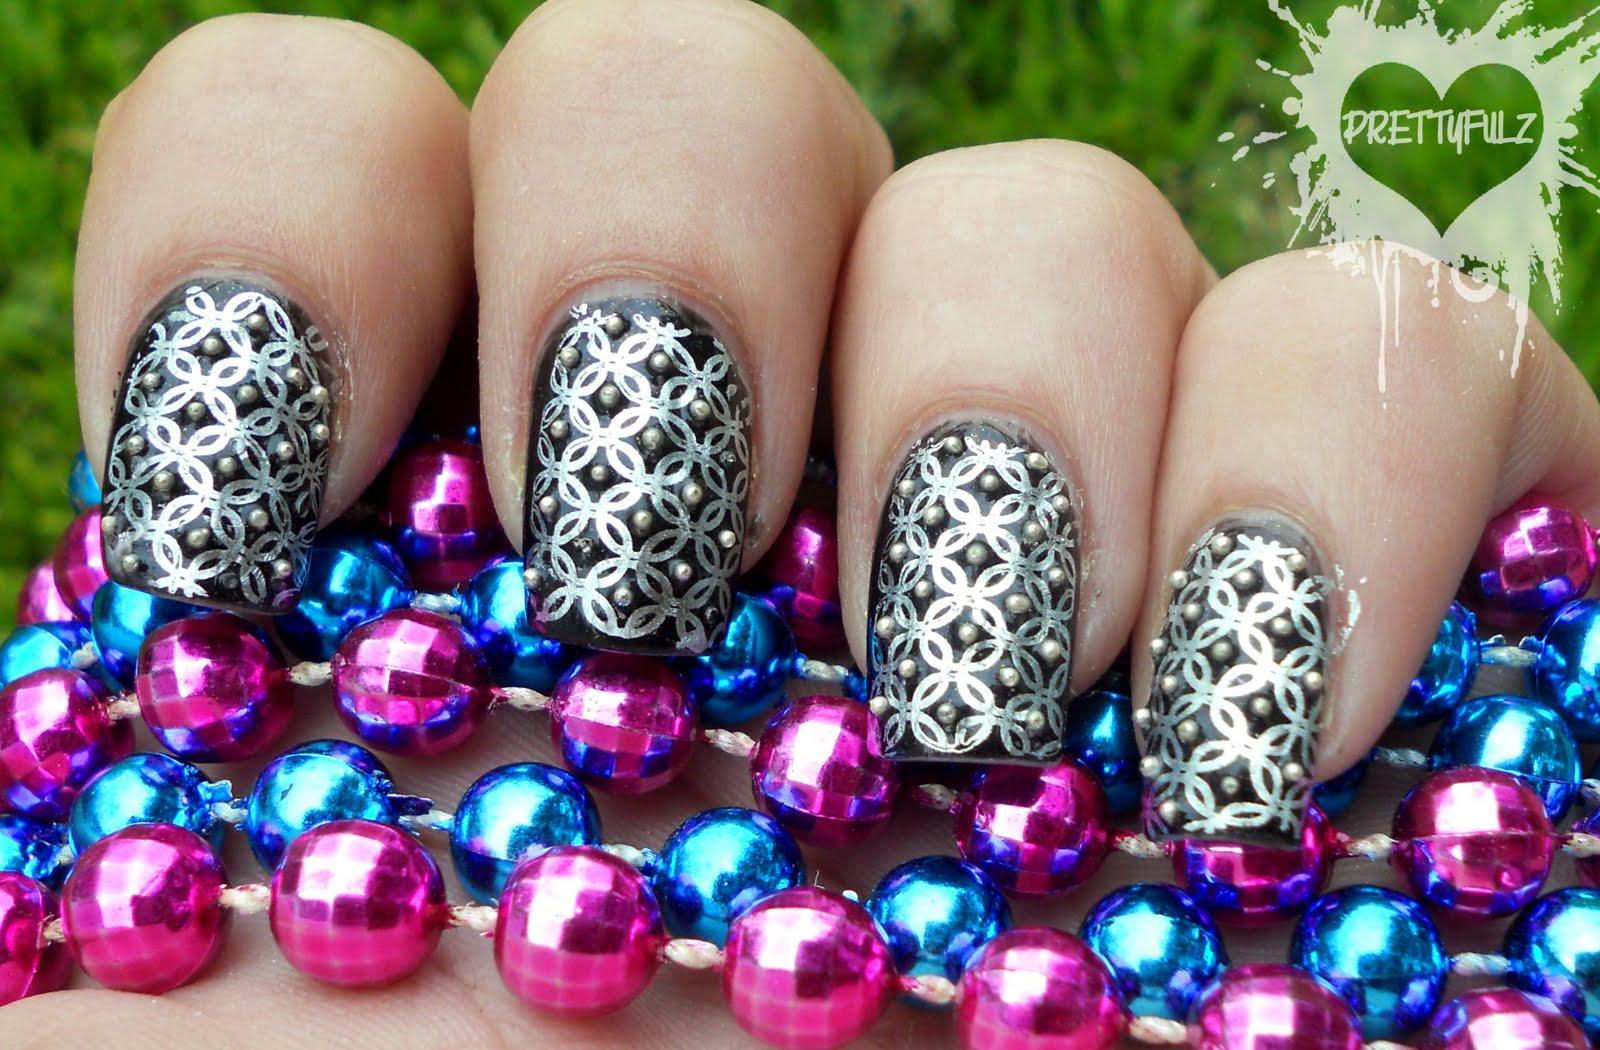 Prettyfulz Black Silver Deco Nail Art Design